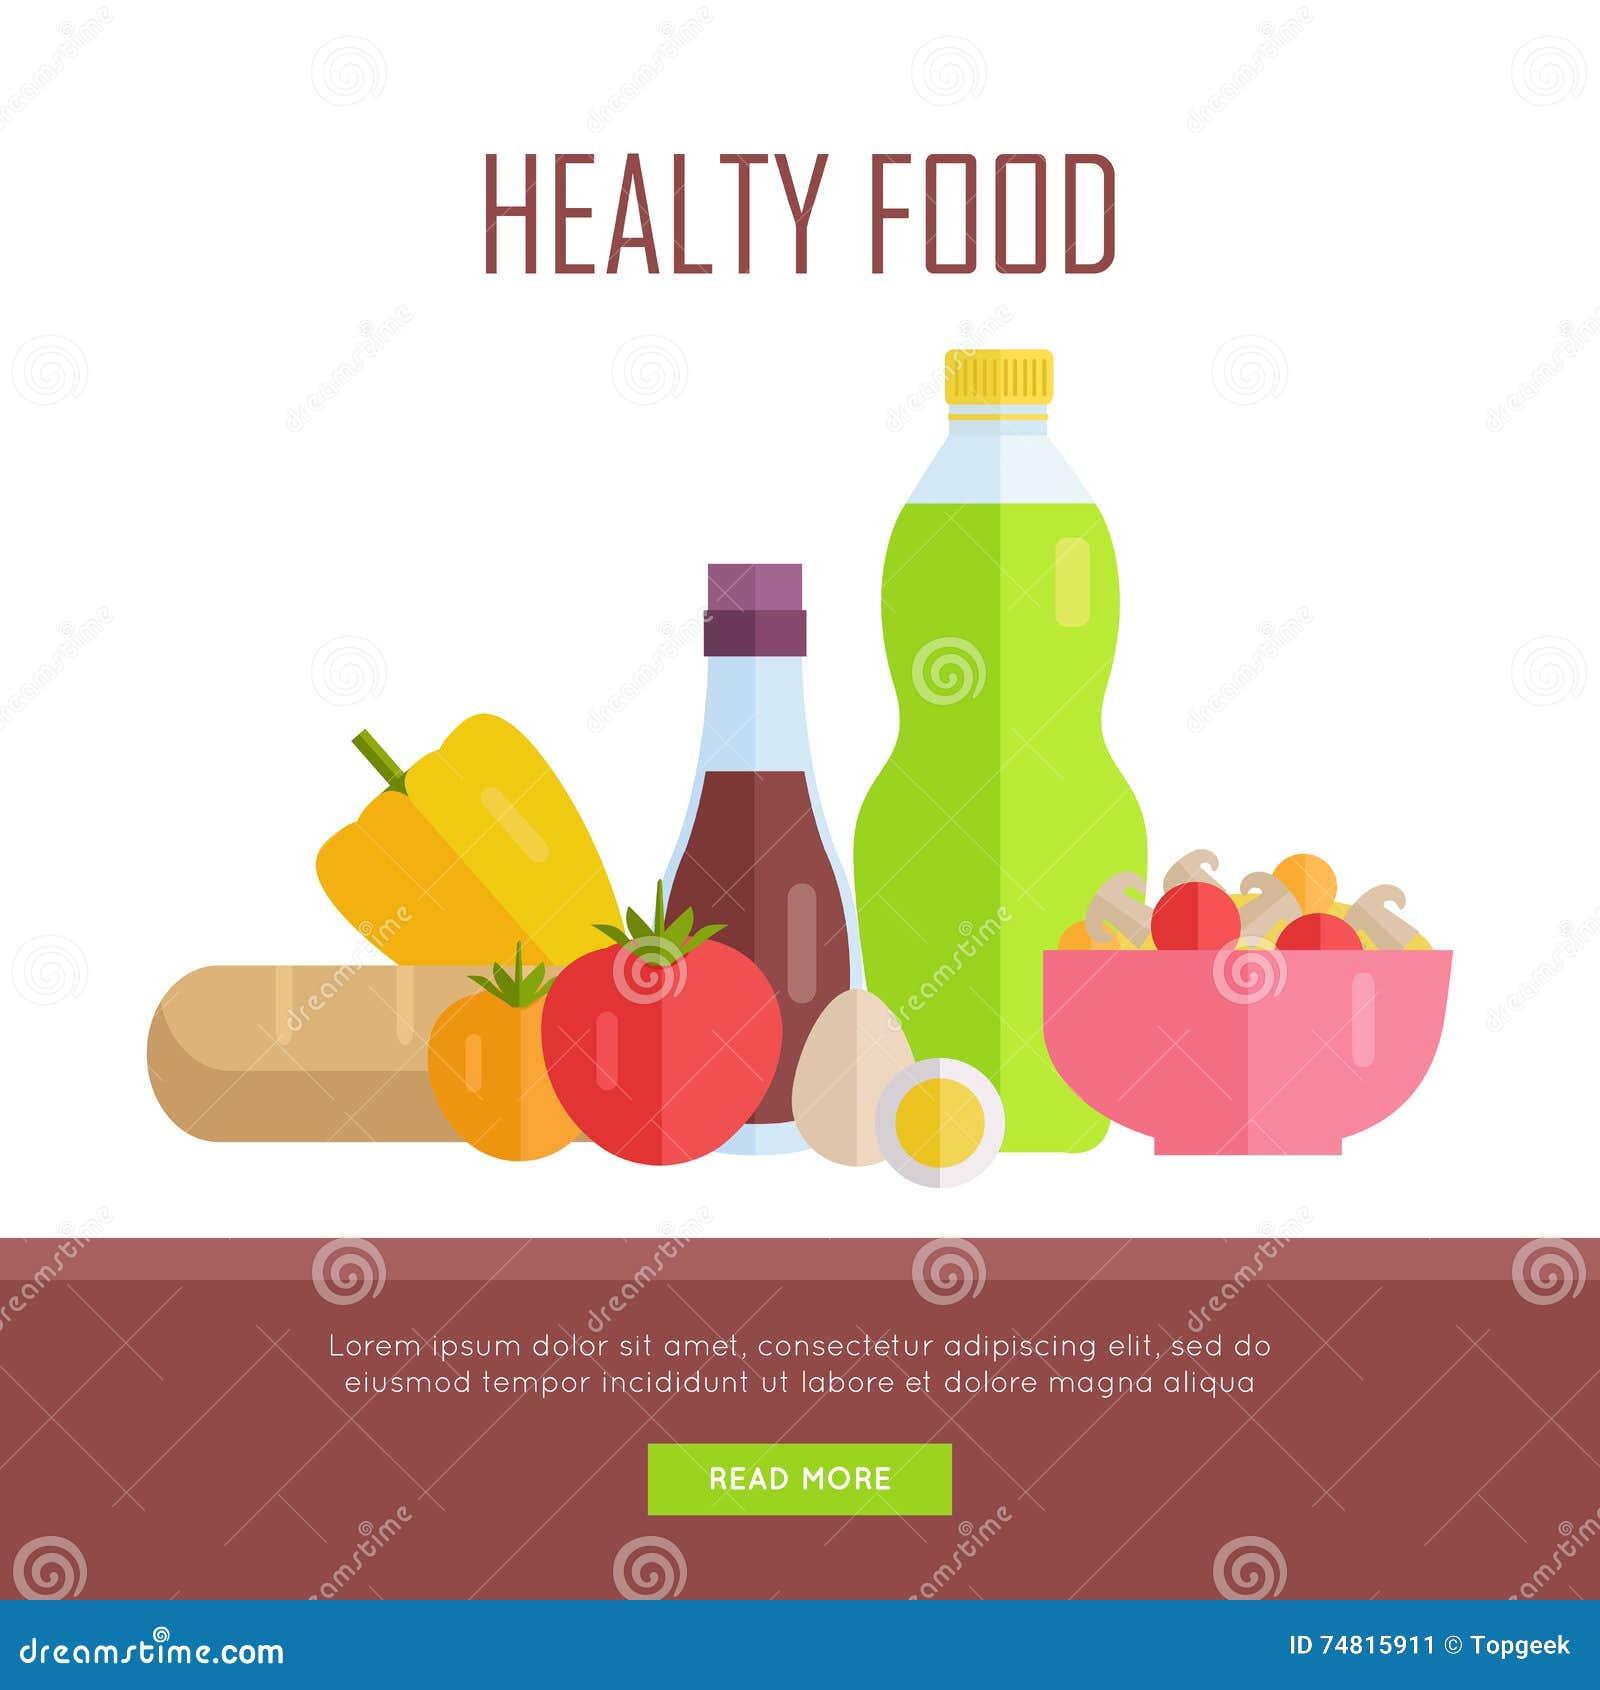 Health Food Stores Lloydminster